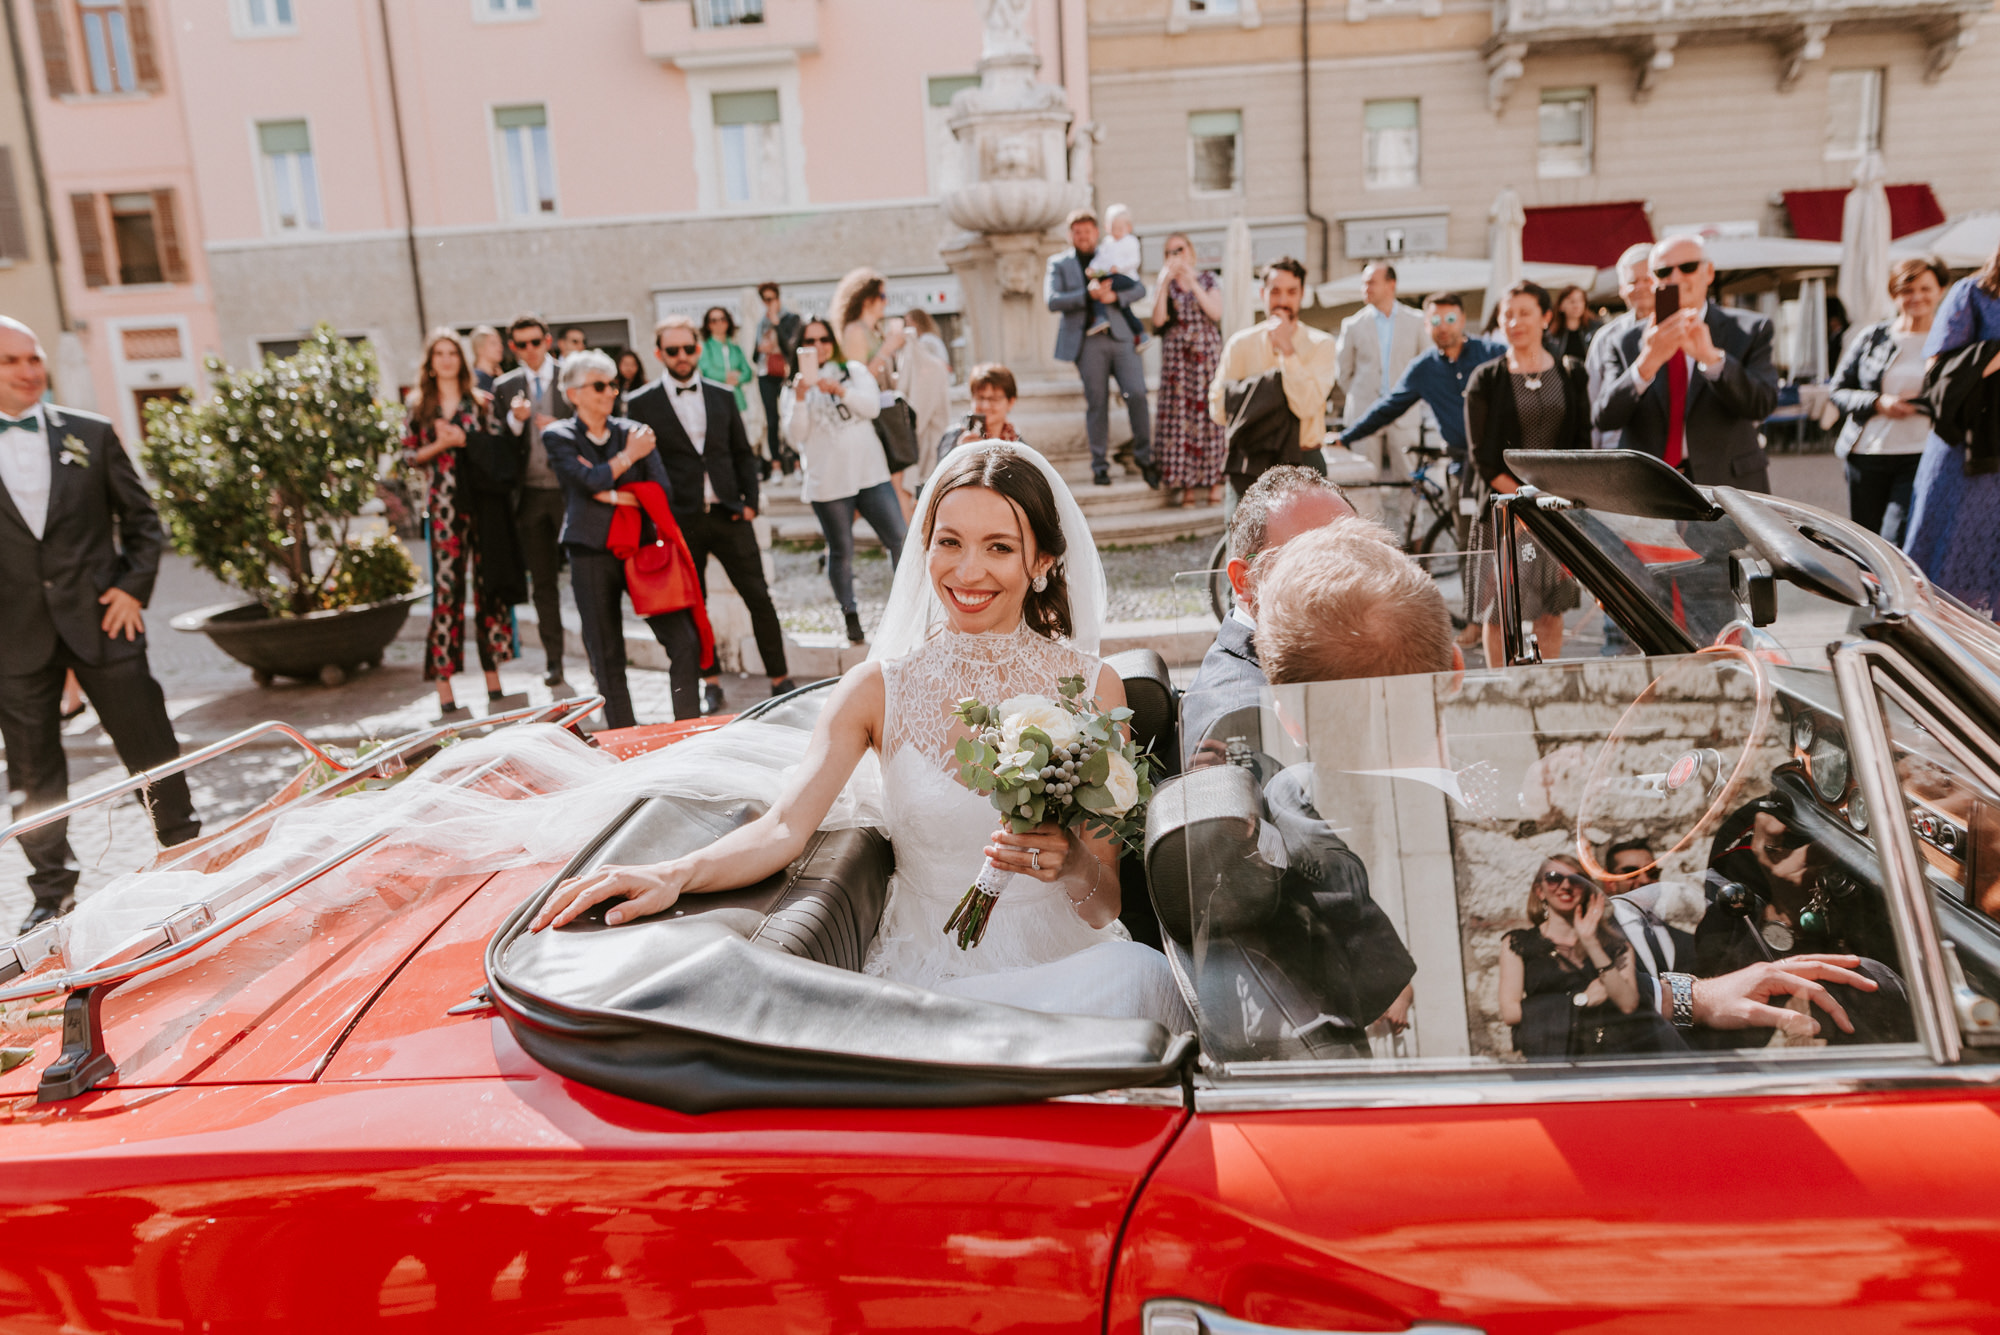 FOTO+PHOTO+BODA+WEDDING+ITALIA+ITALY+MAURICIO+GARAY+MAURICIOGARAY+WEDDINPHOTOGRAPHER+FOTOGRAFODEBODA-1124.jpg